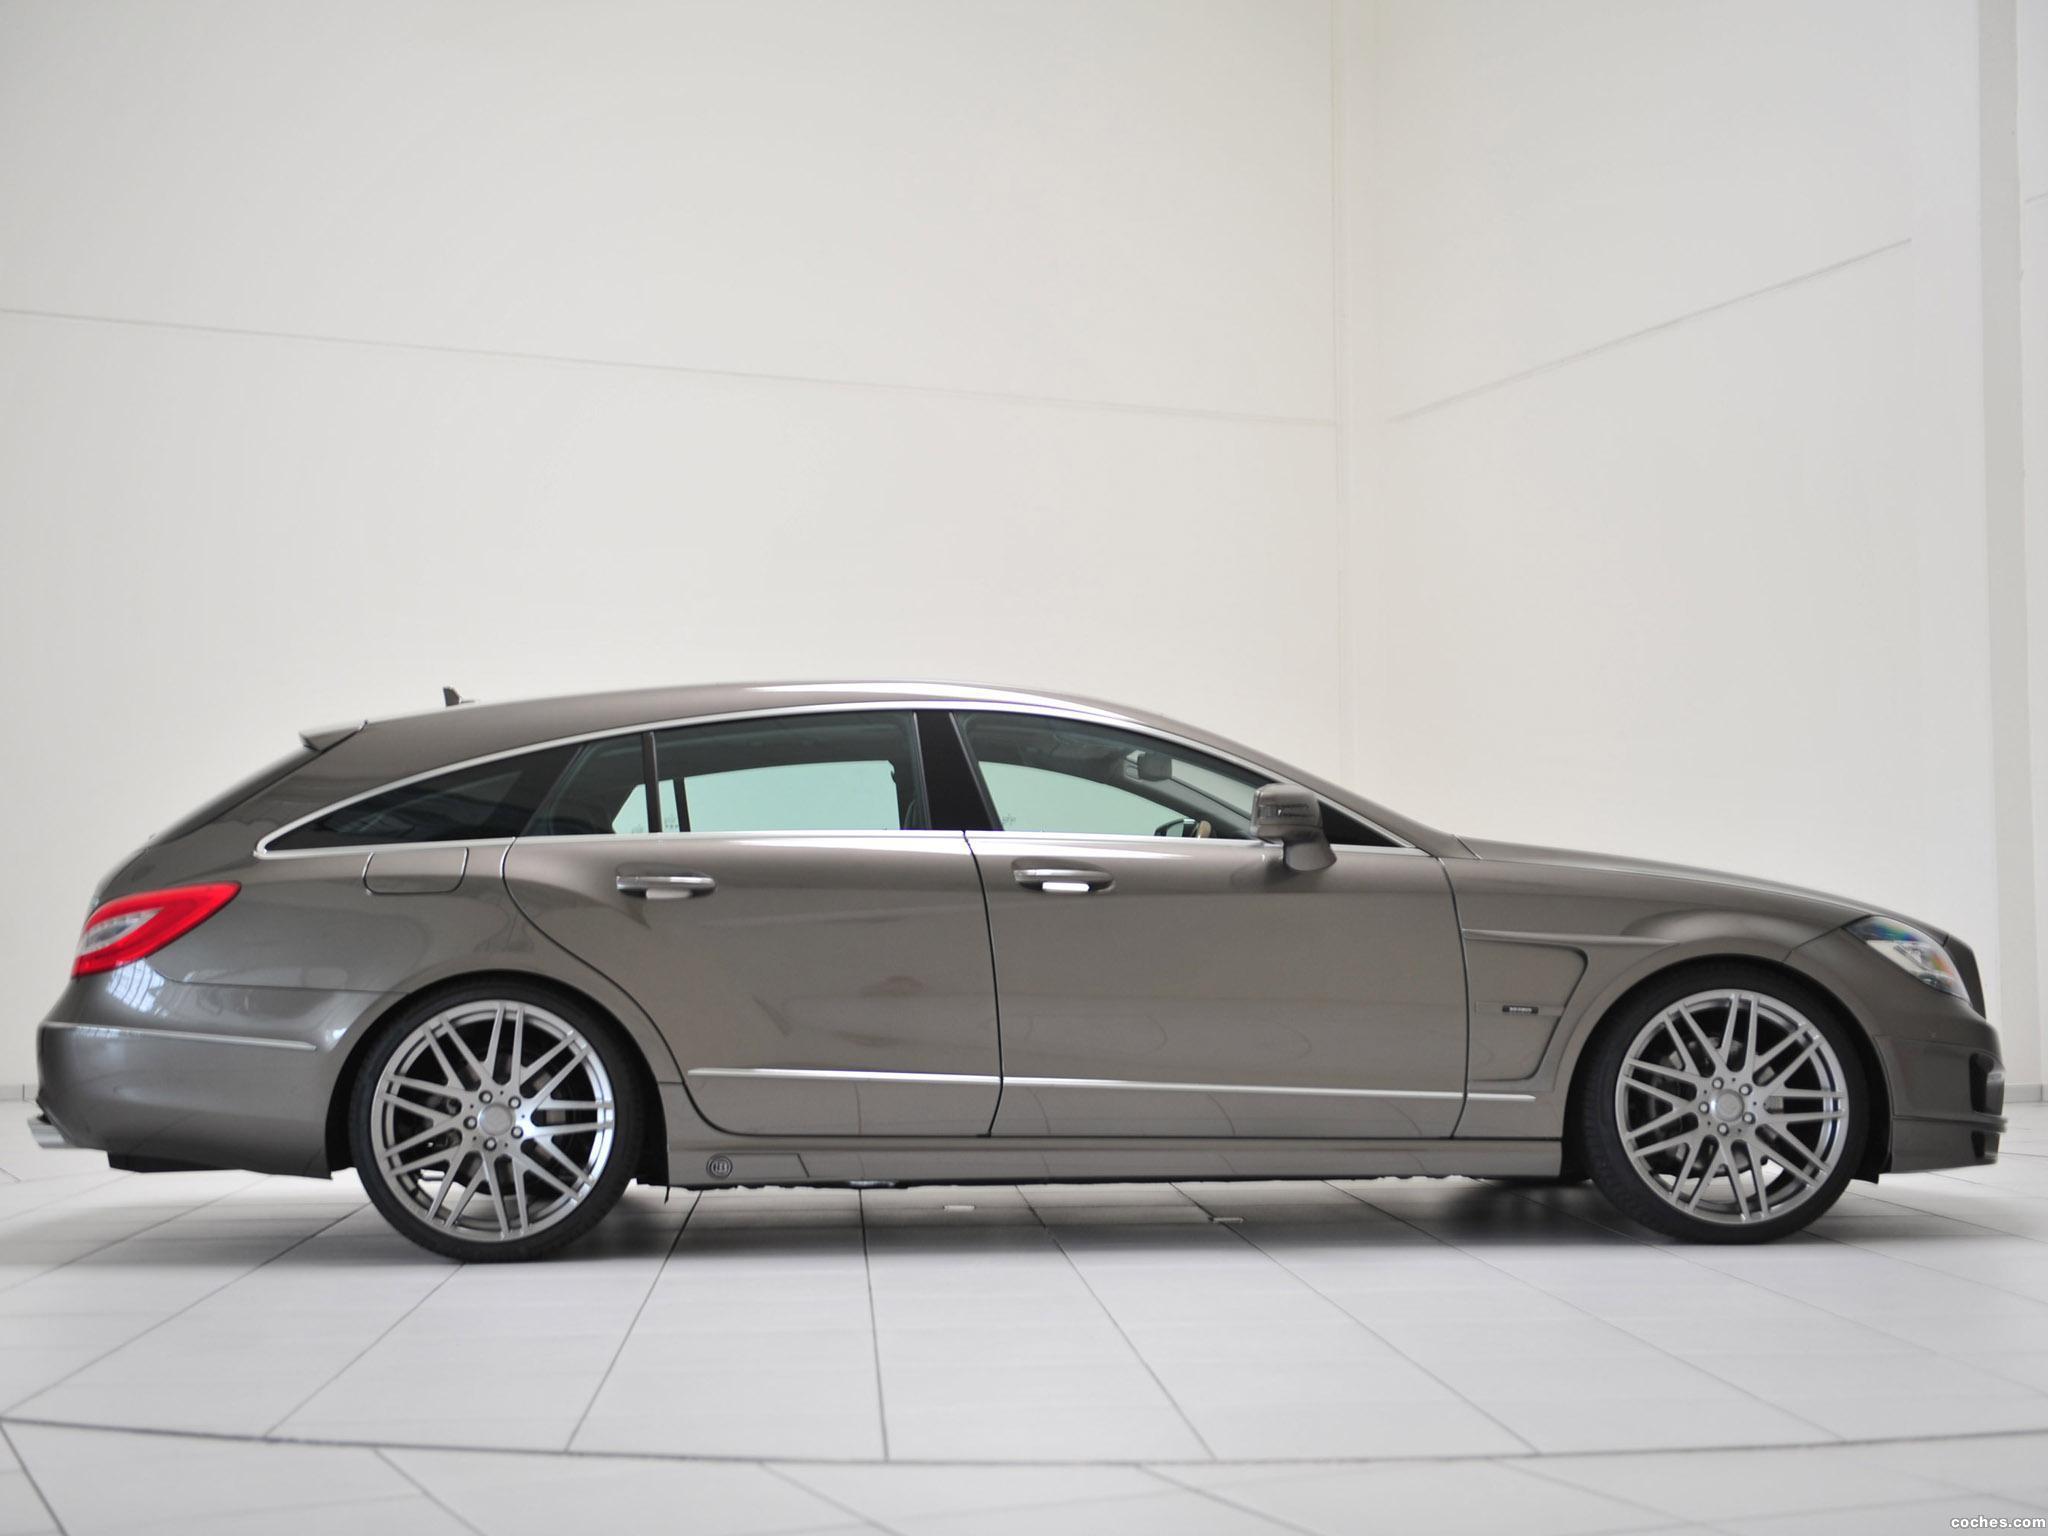 Foto 1 de Mercedes Brabus CLS Shooting Brake X218 2012